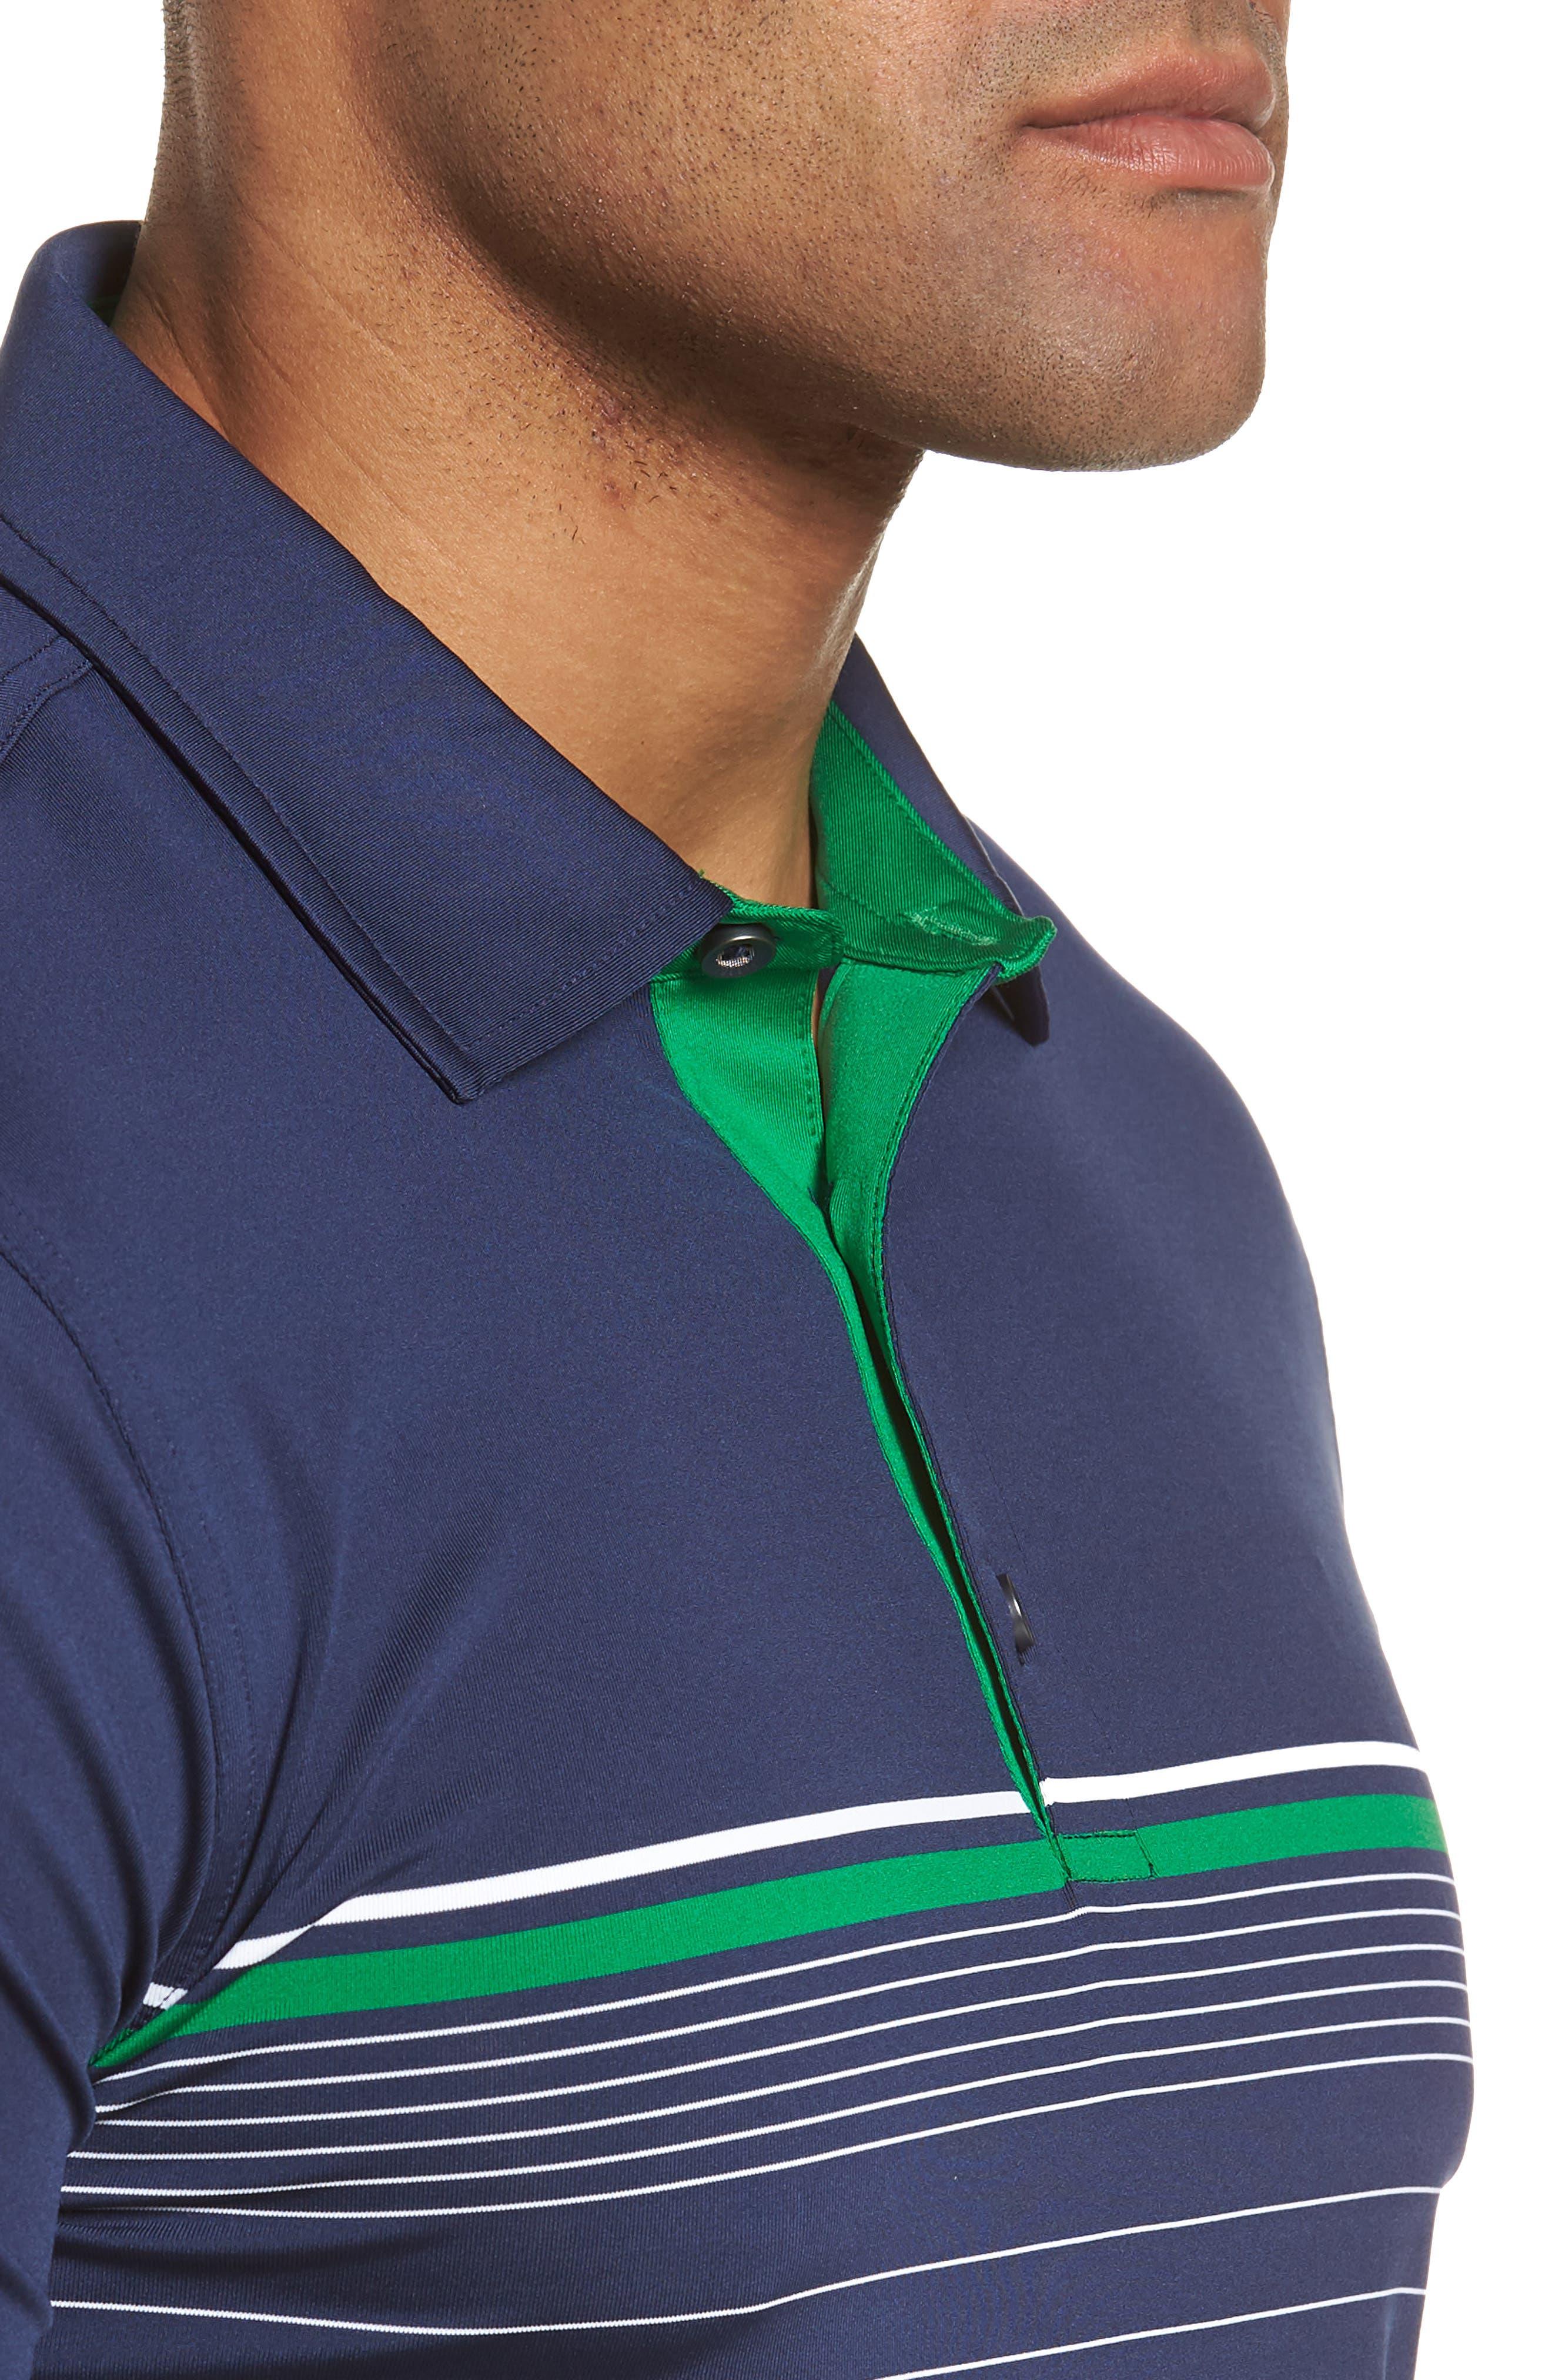 R18 Tech Skill Stripe Polo,                             Alternate thumbnail 4, color,                             Navy